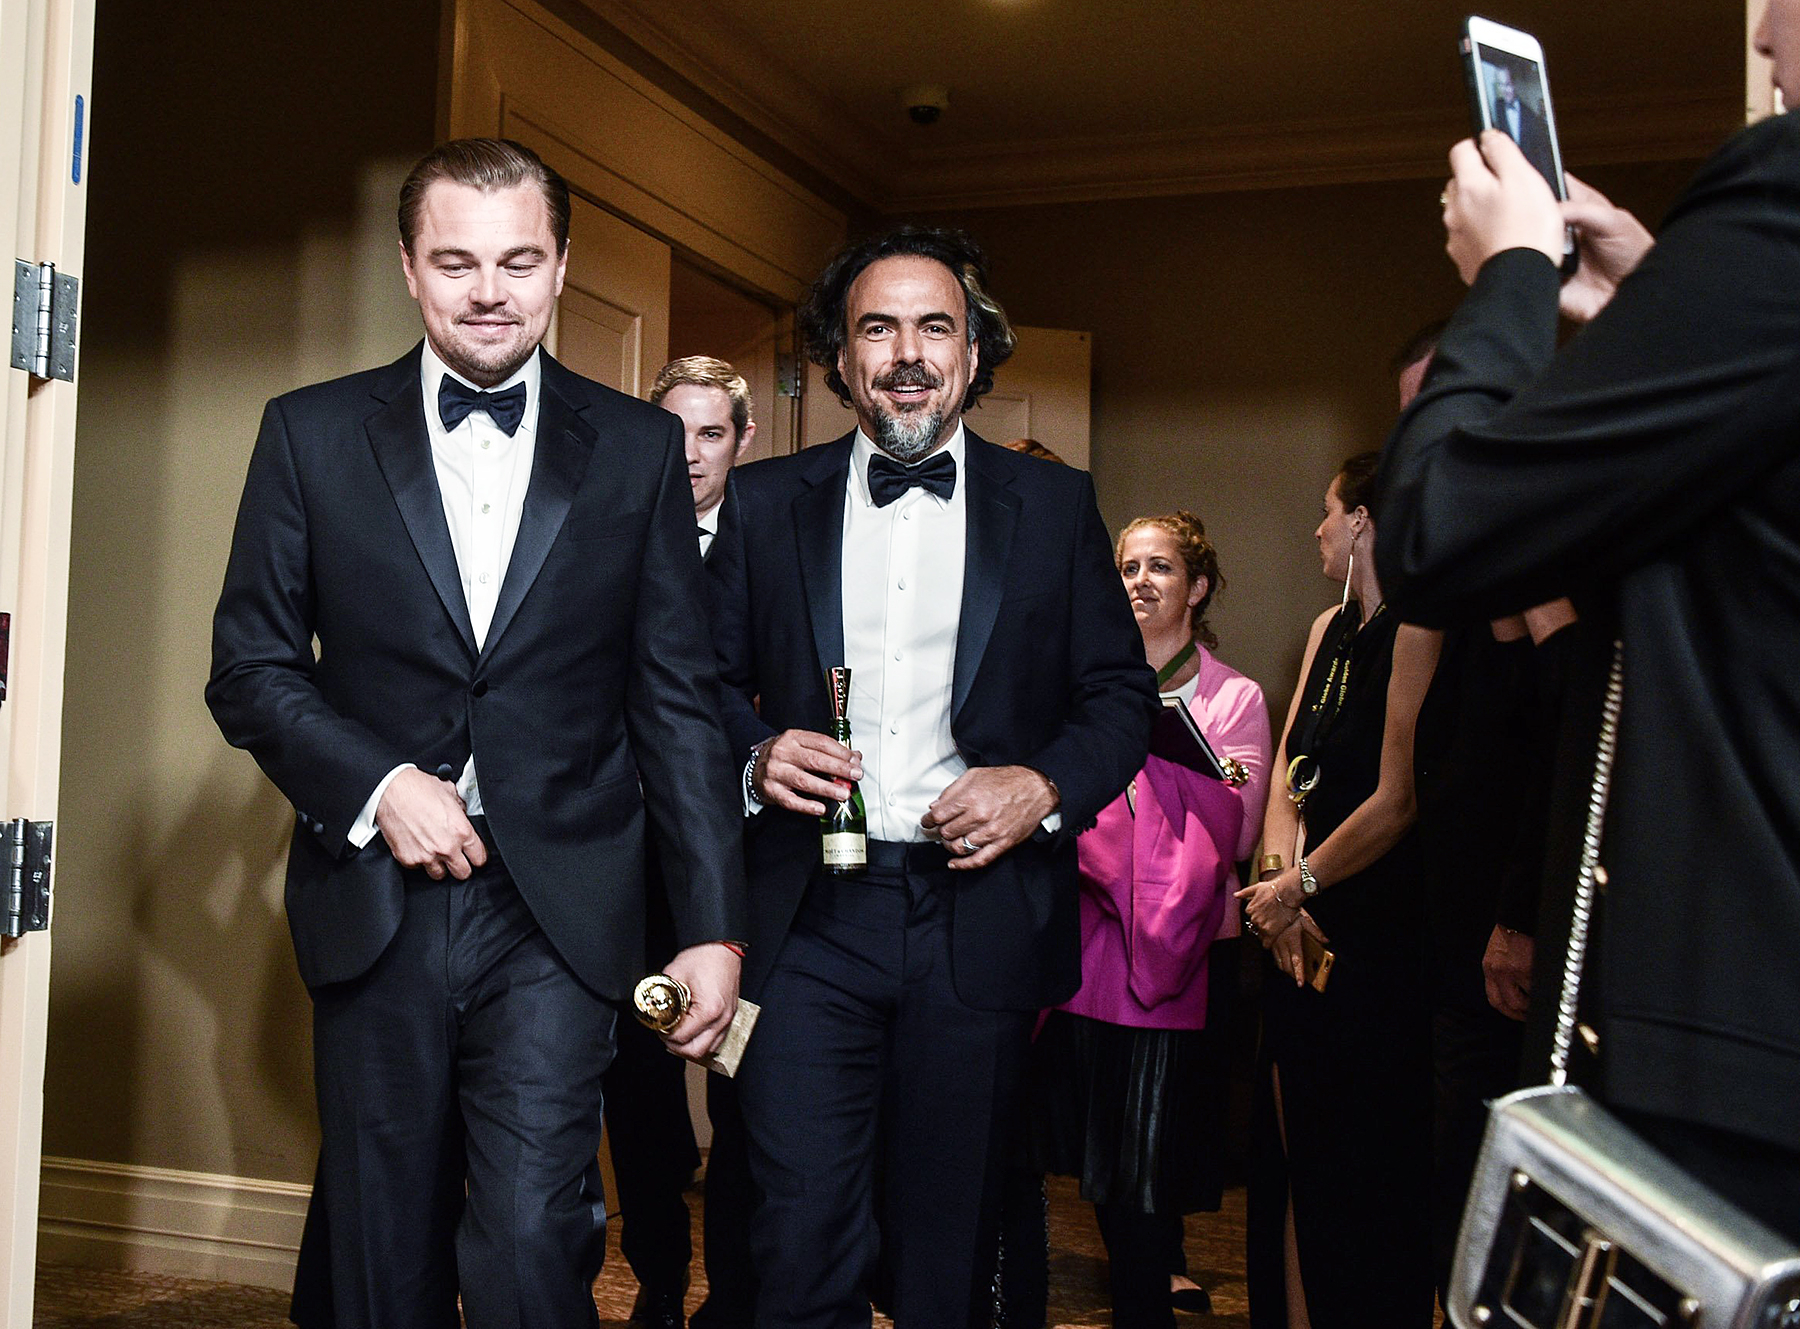 Leonardo DiCaprio and director Alejandro Gonzalez Inarritu in the press room at the Golden Globes 2016